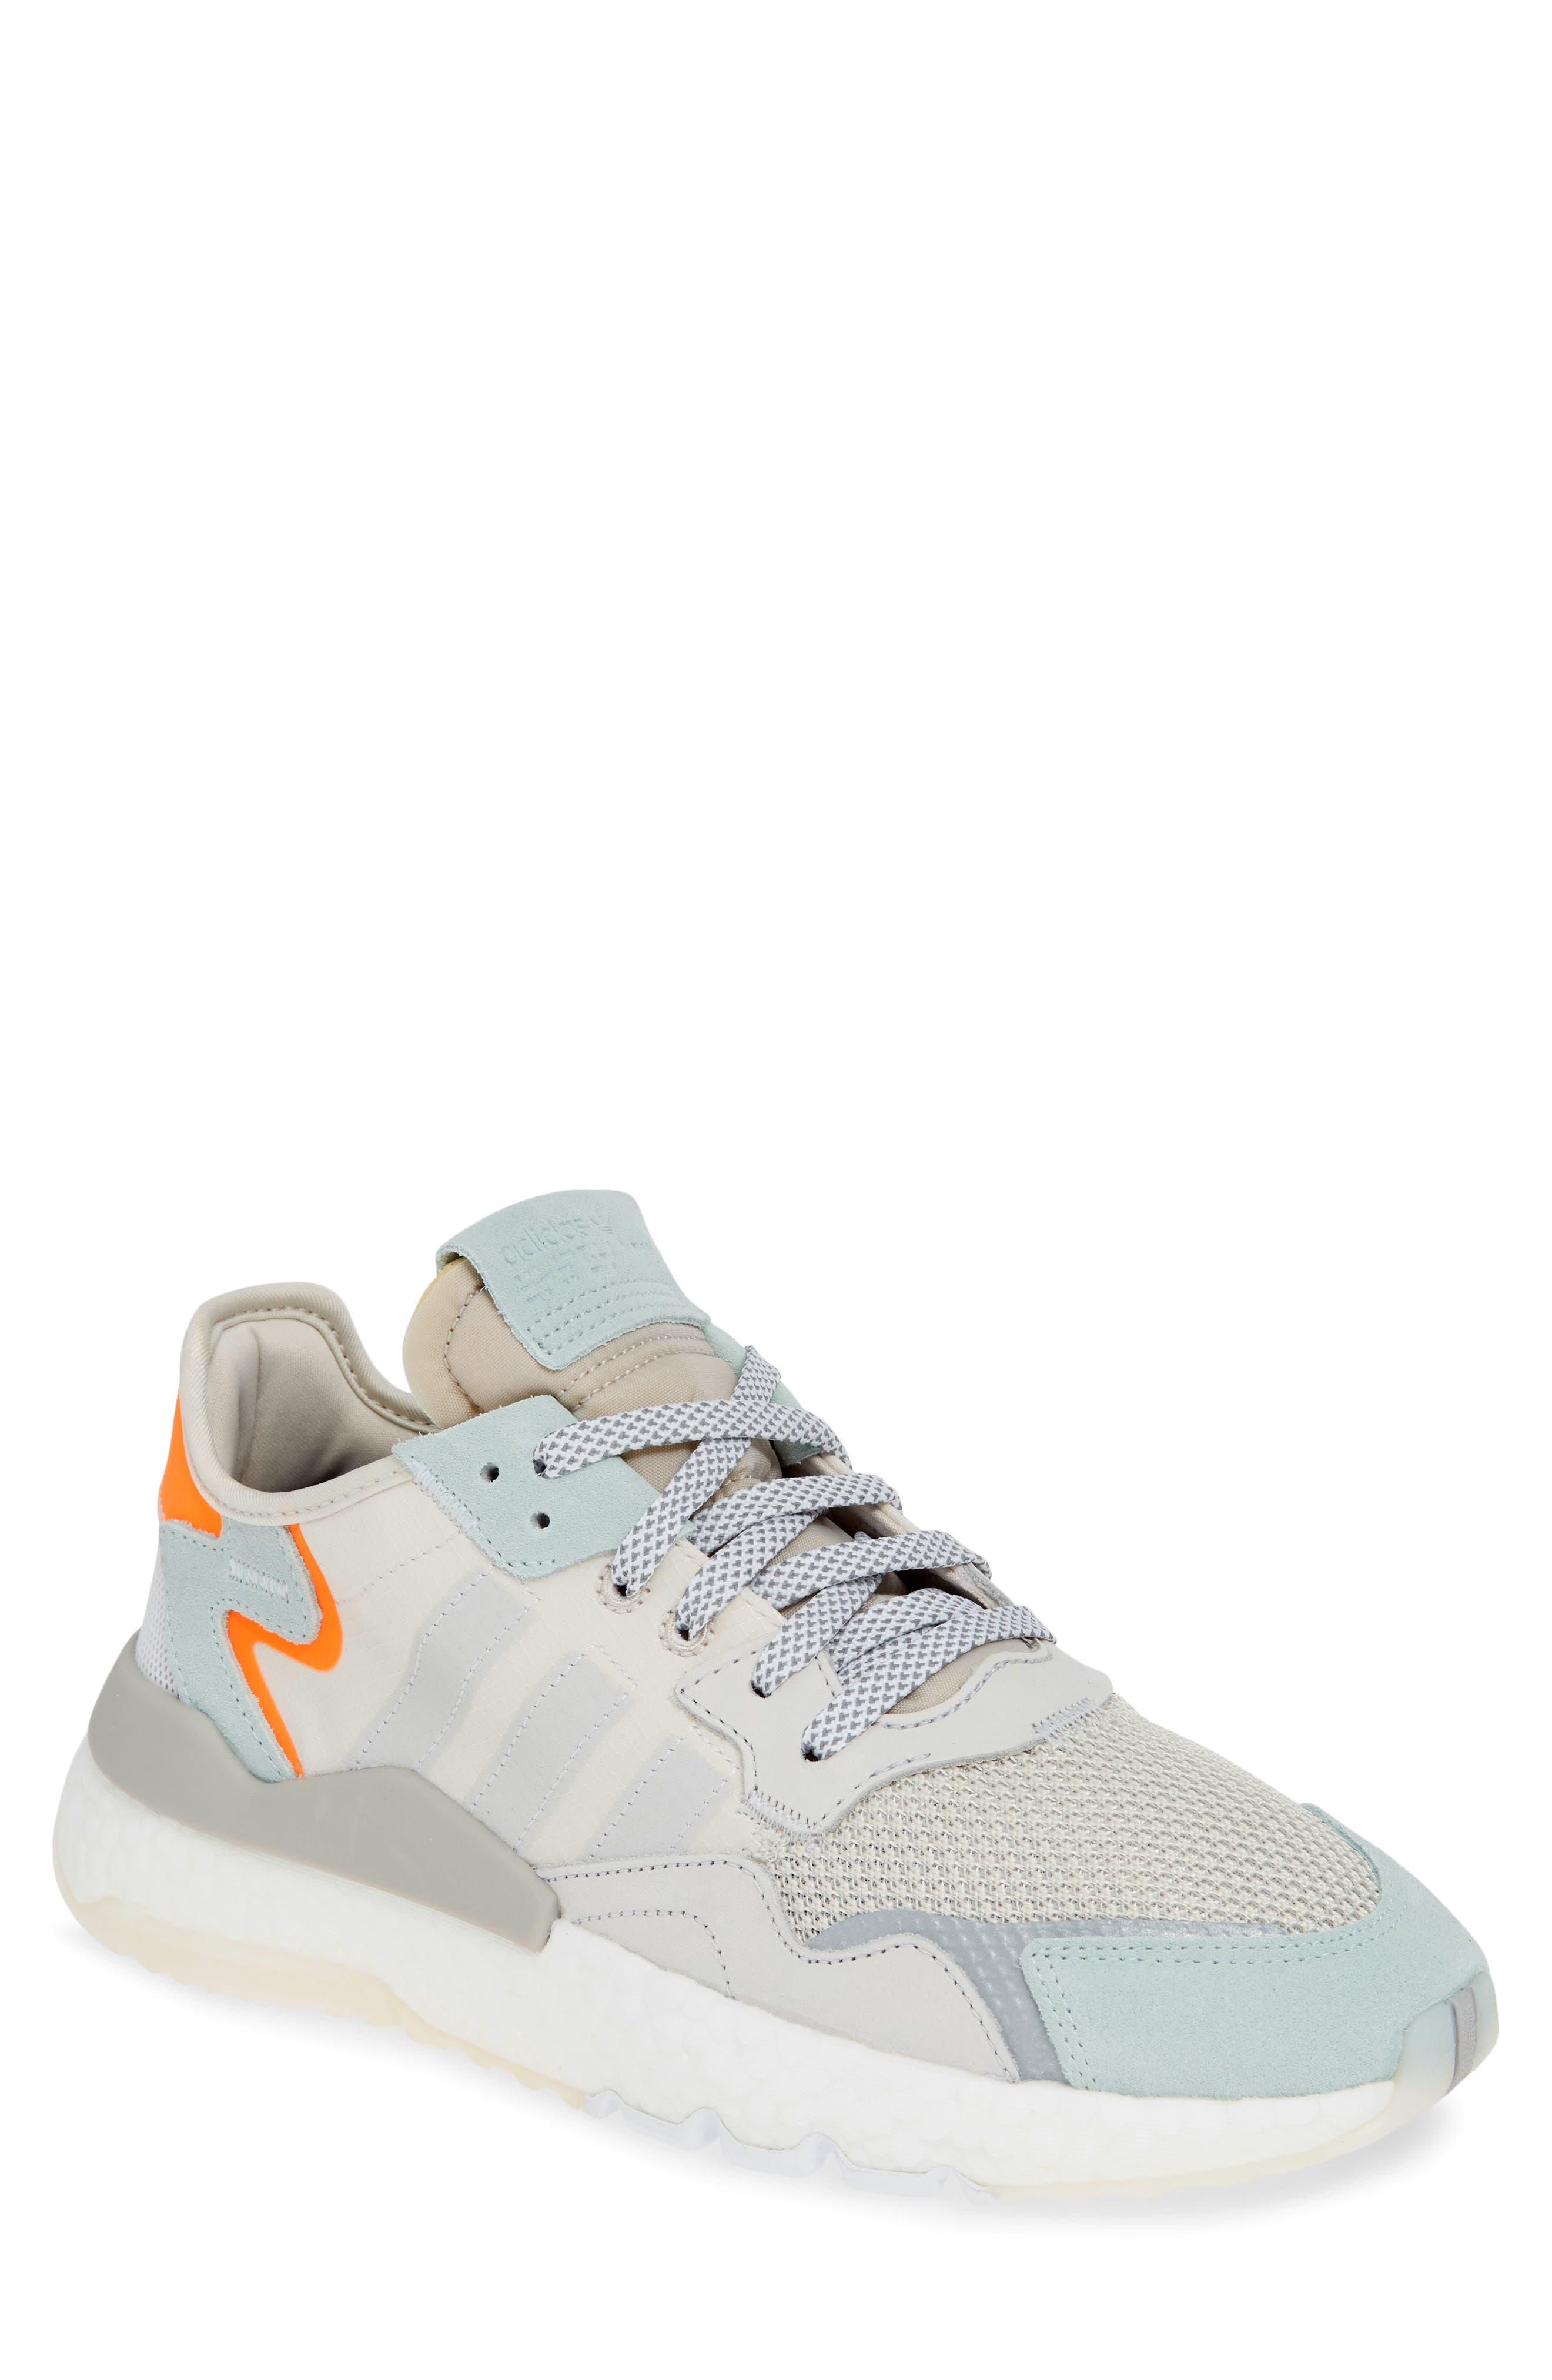 ADIDAS Nite Jogger Sneaker, Main, color, RAW WHITE/ GREY/ VAPOR GREEN